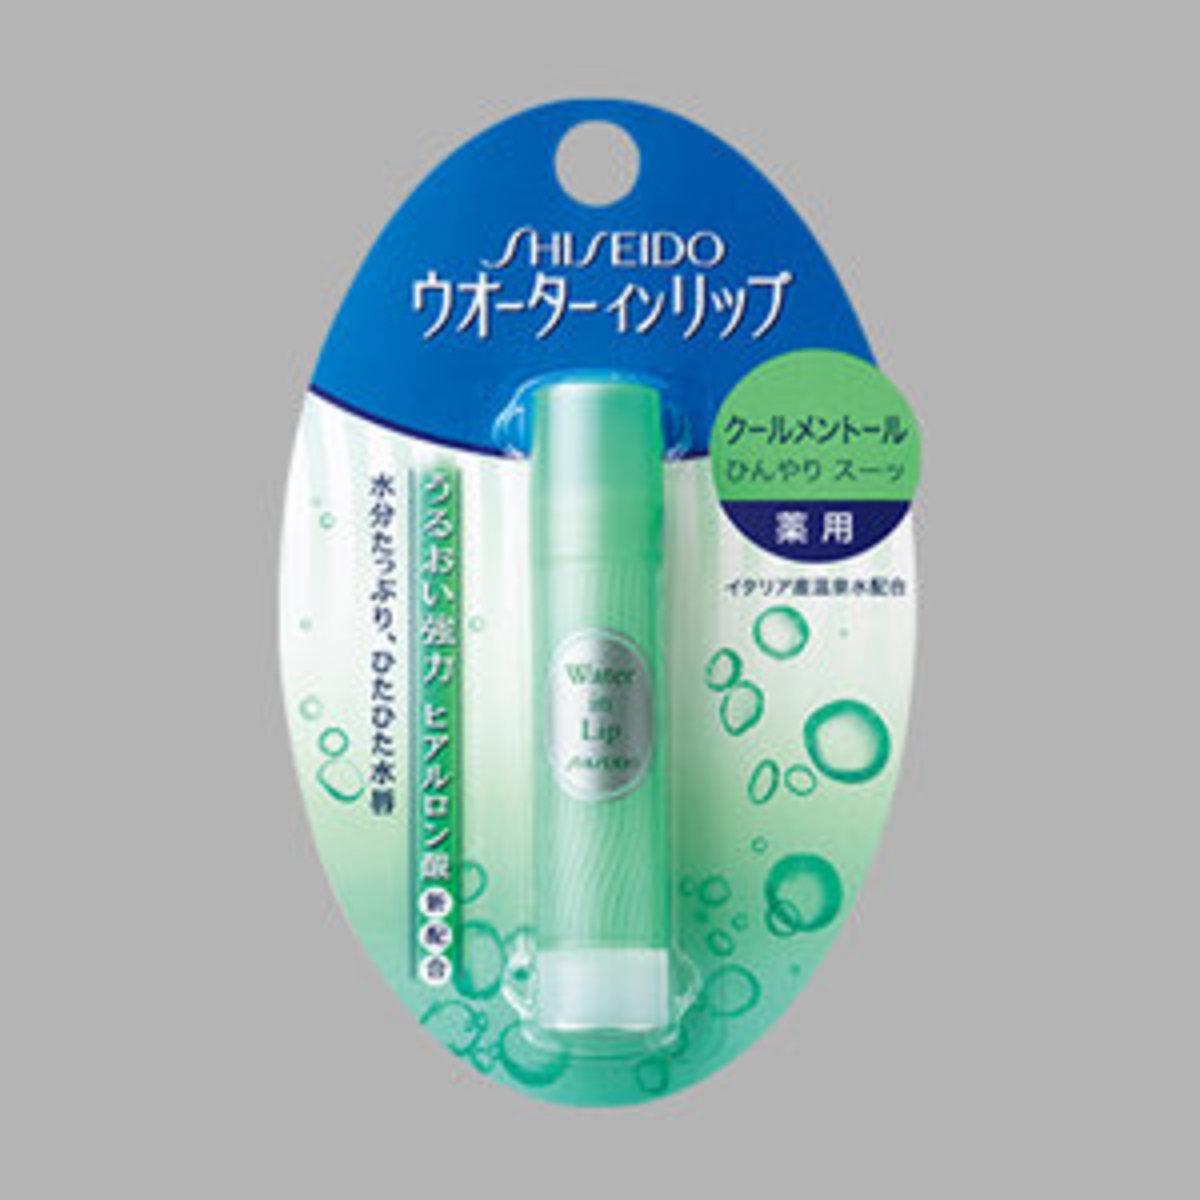 WIL藥用清涼薄荷潤唇膏3.5g